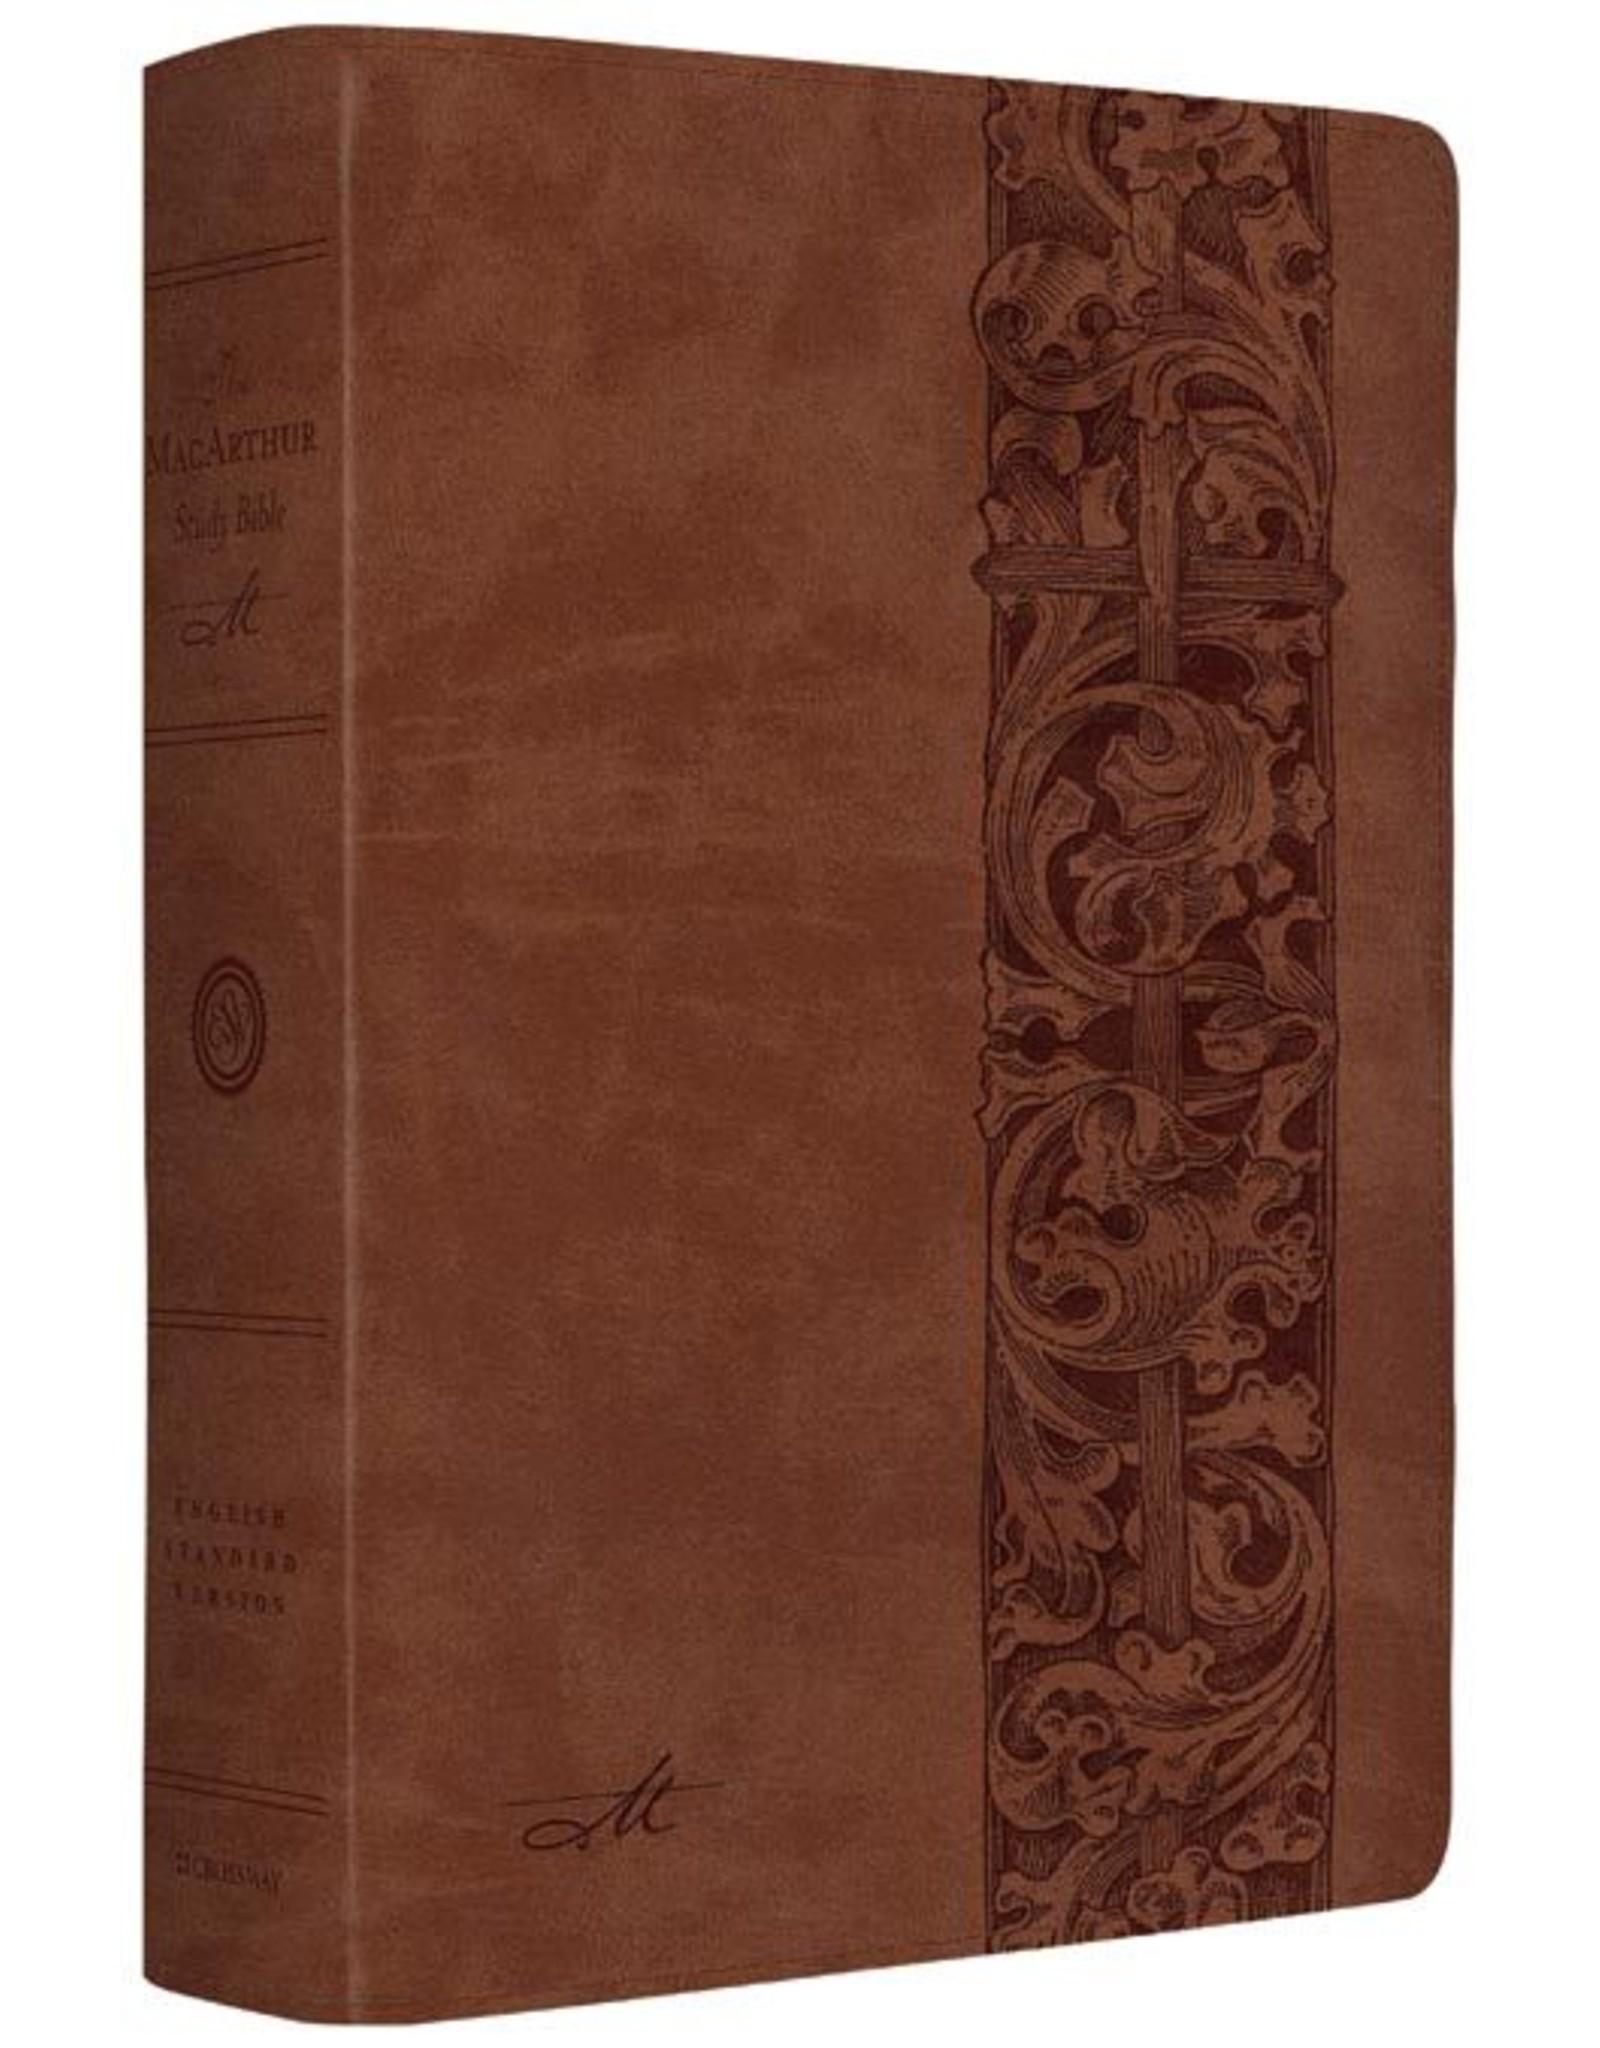 Crossway / Good News MacArthur Study Bible ESV - TruTone Brown/Woodcut